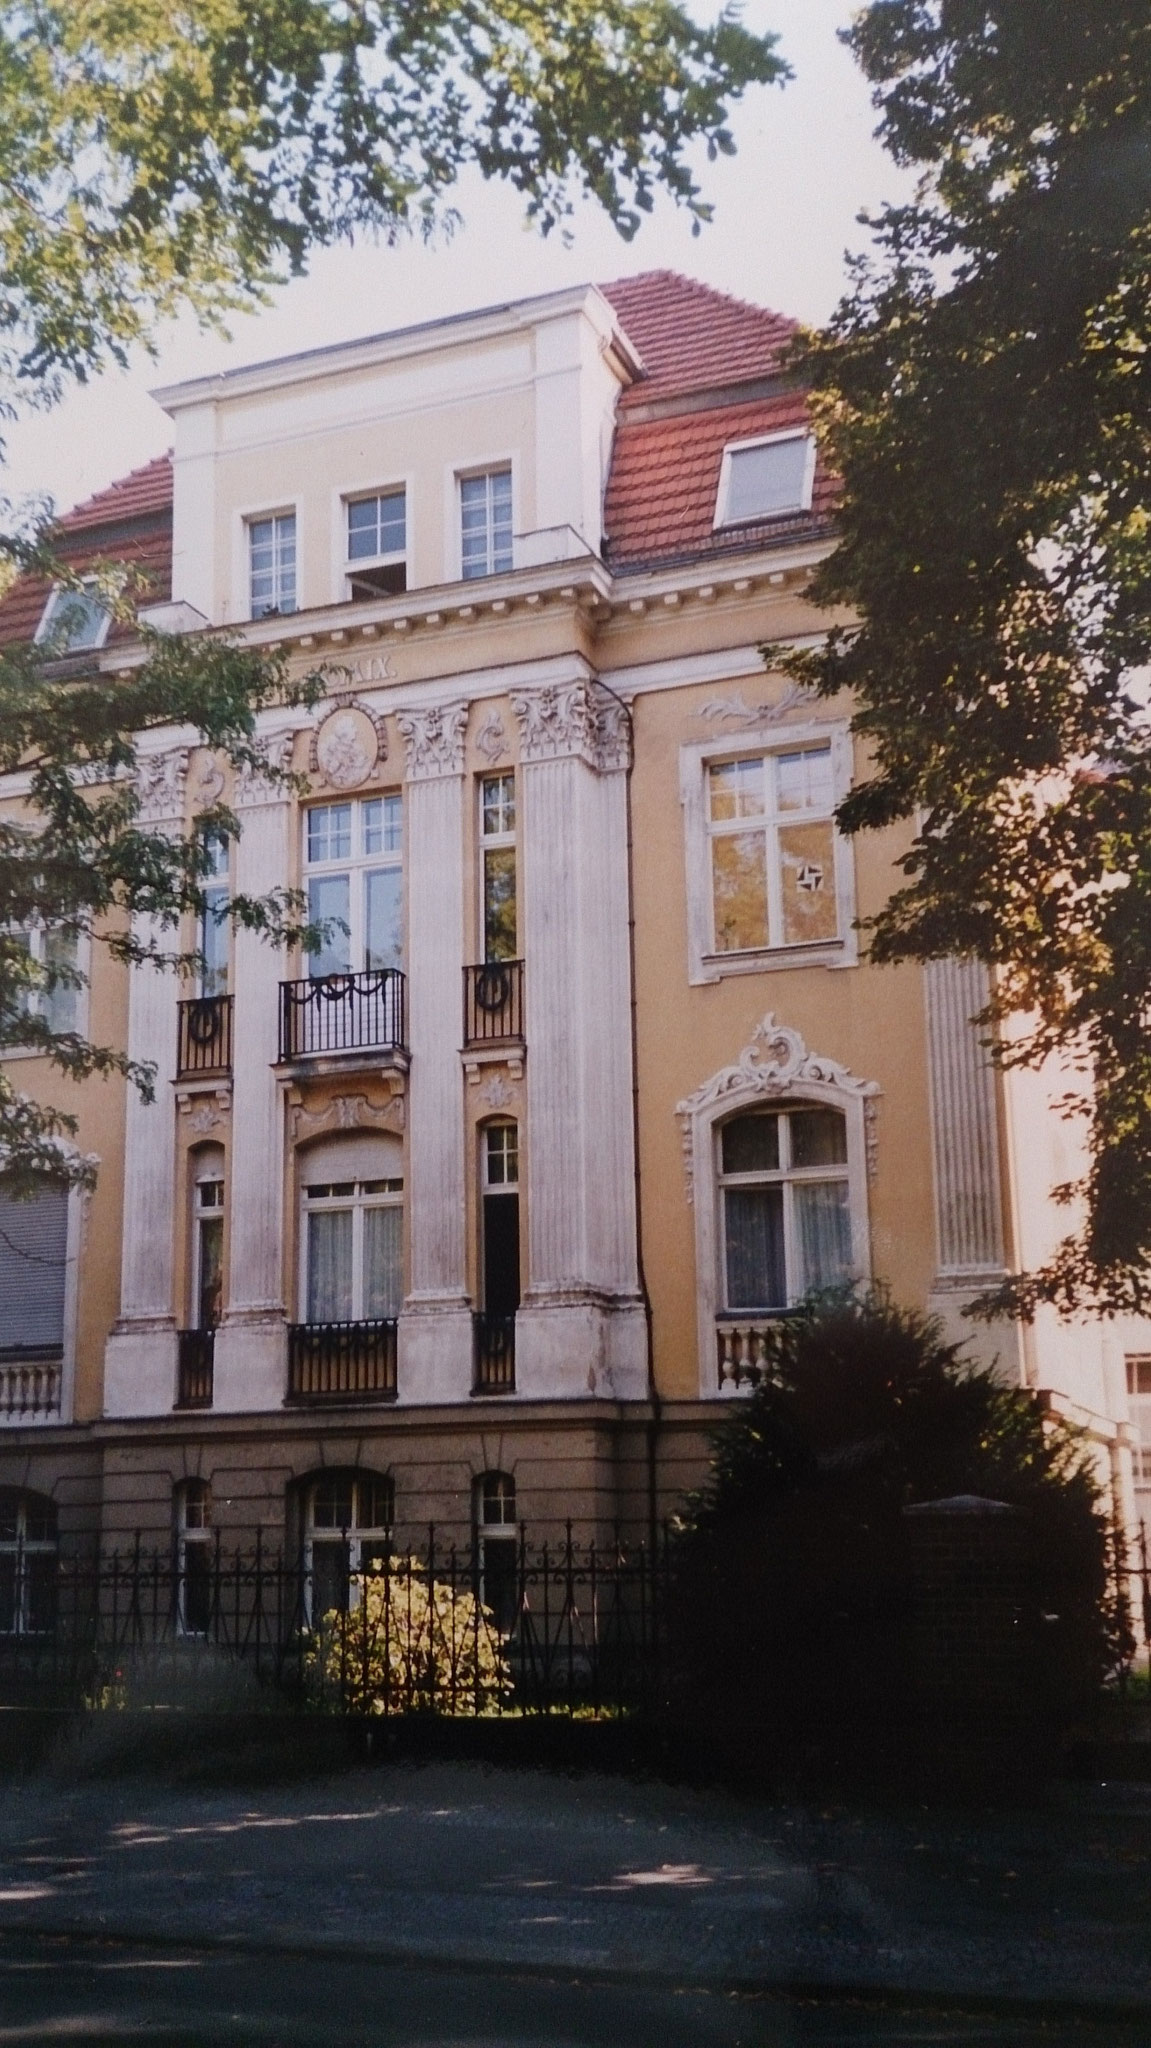 Berlin-Grunewald, Caspar-Theysstraße 9